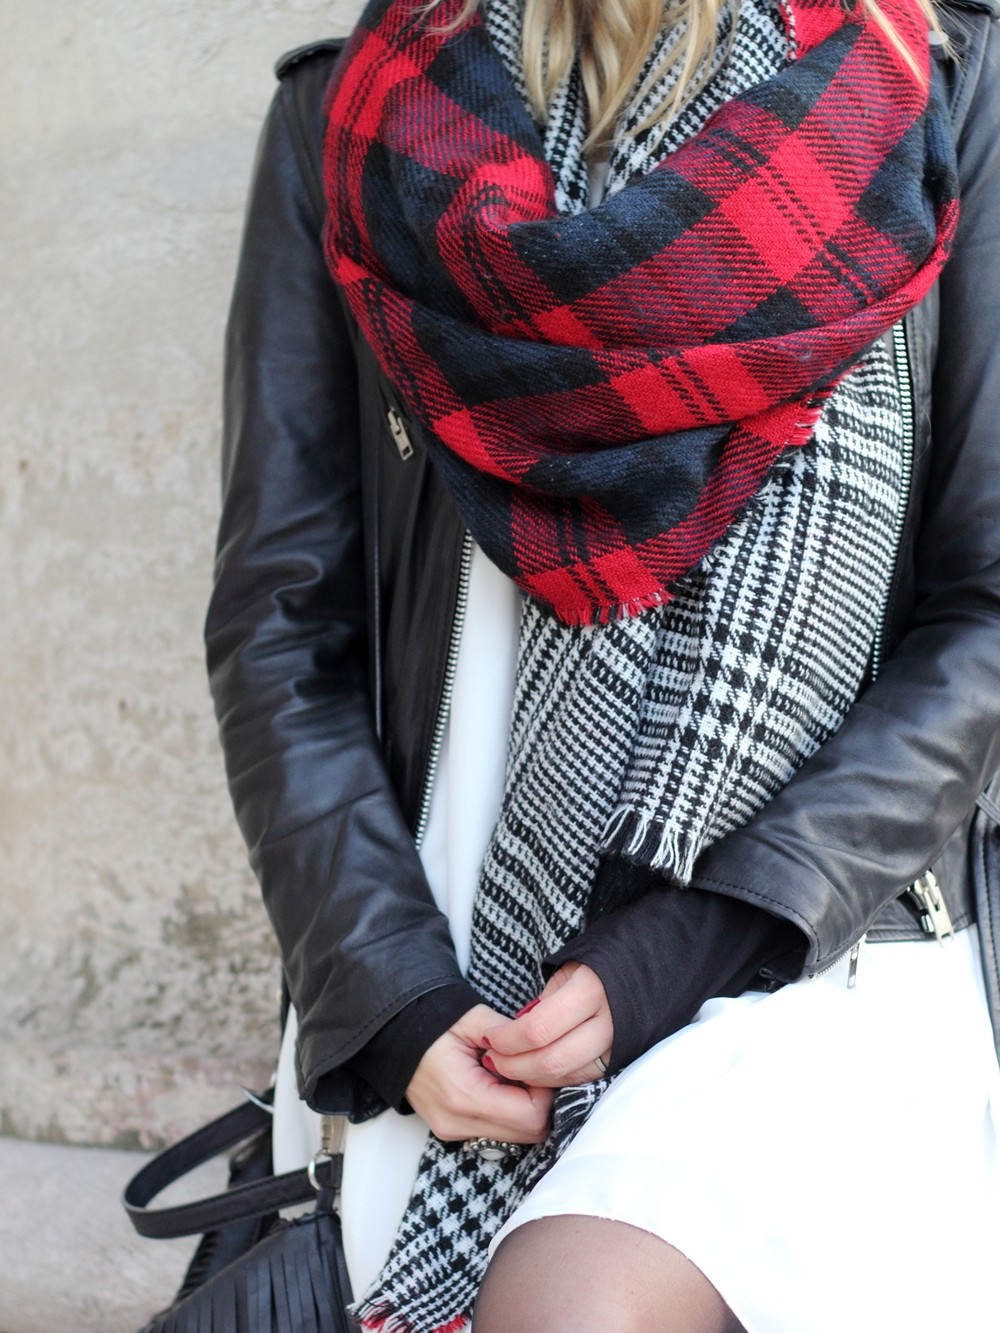 Fashionbloggerin Karlsruhe Outfit München weisses Kleid karierter Schal Lederjacke Hut Fransentasche 6